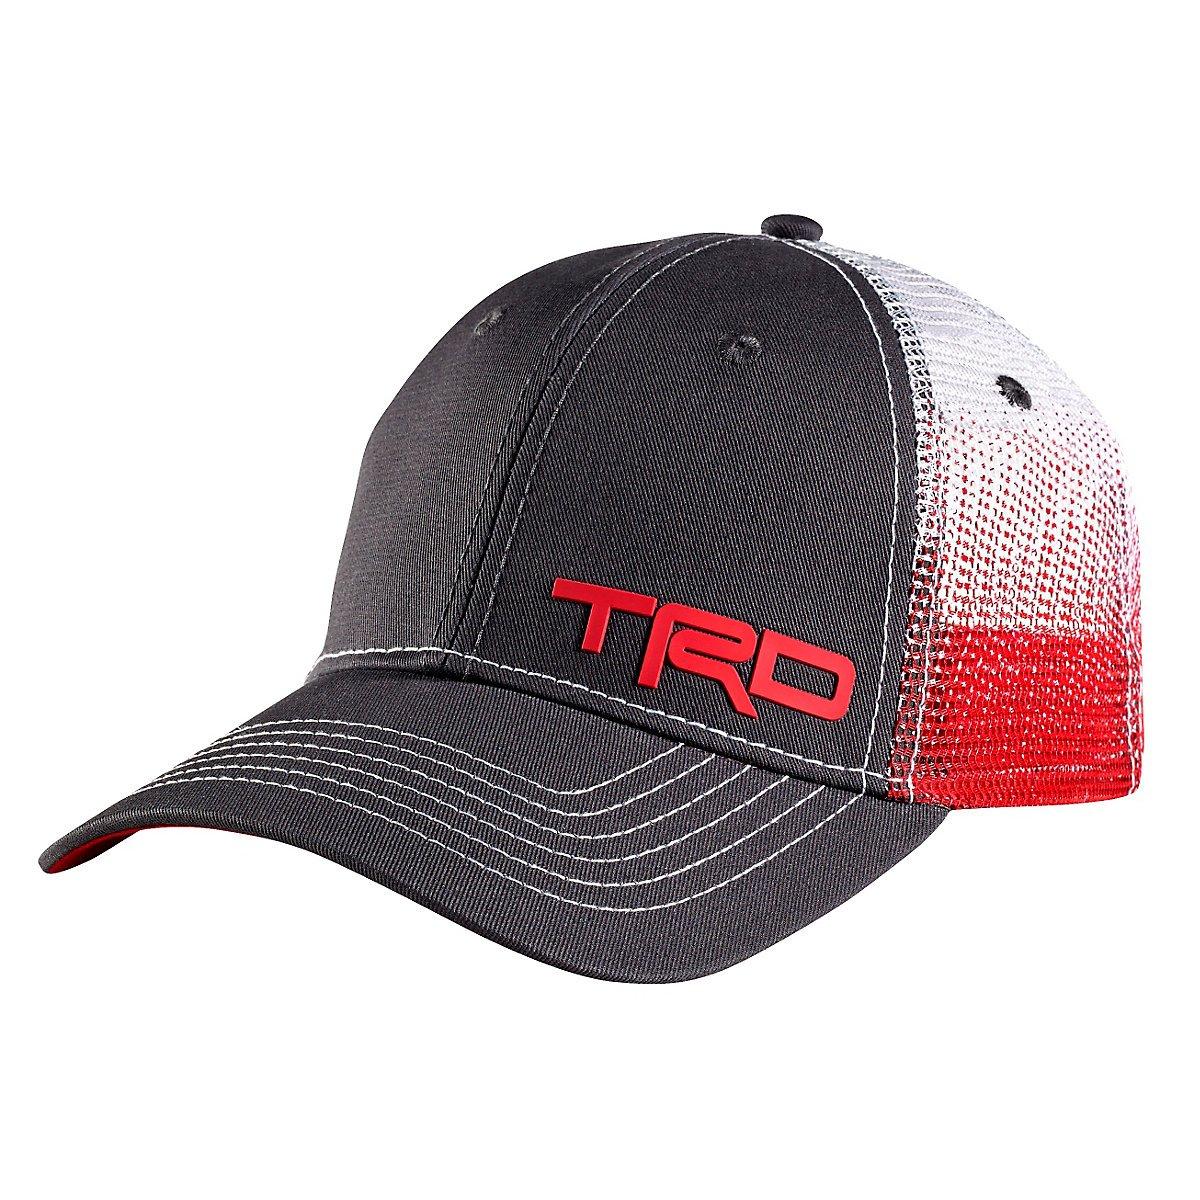 LEXUS Toyota TRD Ombre Mesh Baseball Cap  Amazon.co.uk  Car   Motorbike 47034523c1d8